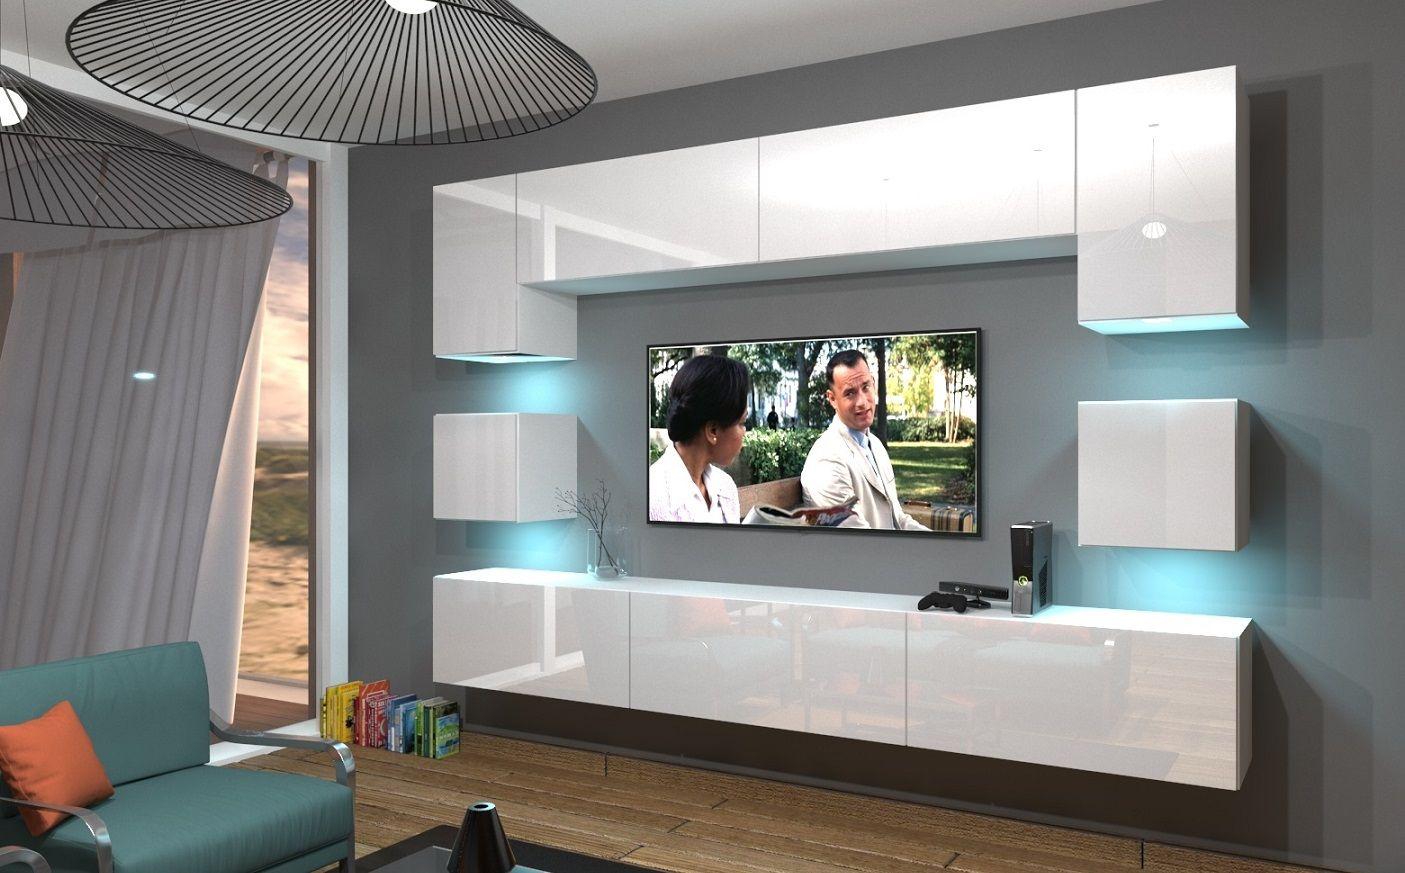 Wohnwand An1 242 Hochglanz Push To Open Funktion Furniture